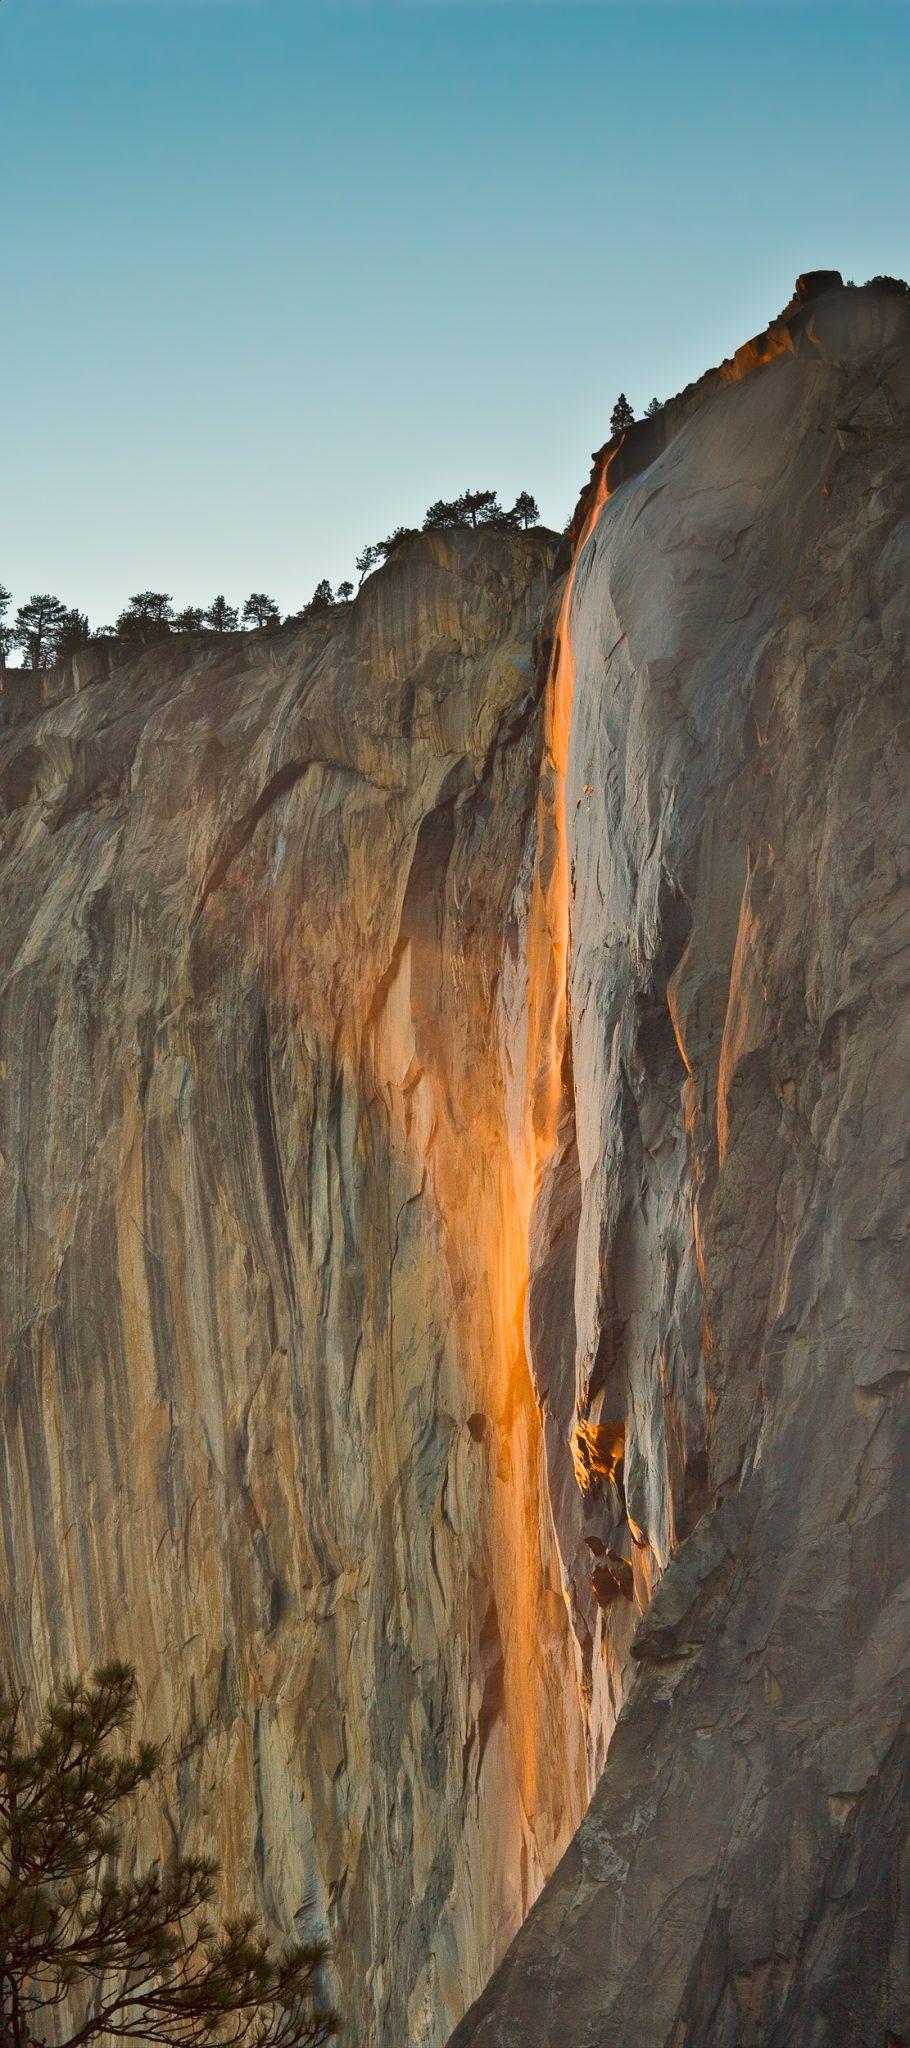 Ephemeral waterfall east face of El Capitan - Yosemite National Park